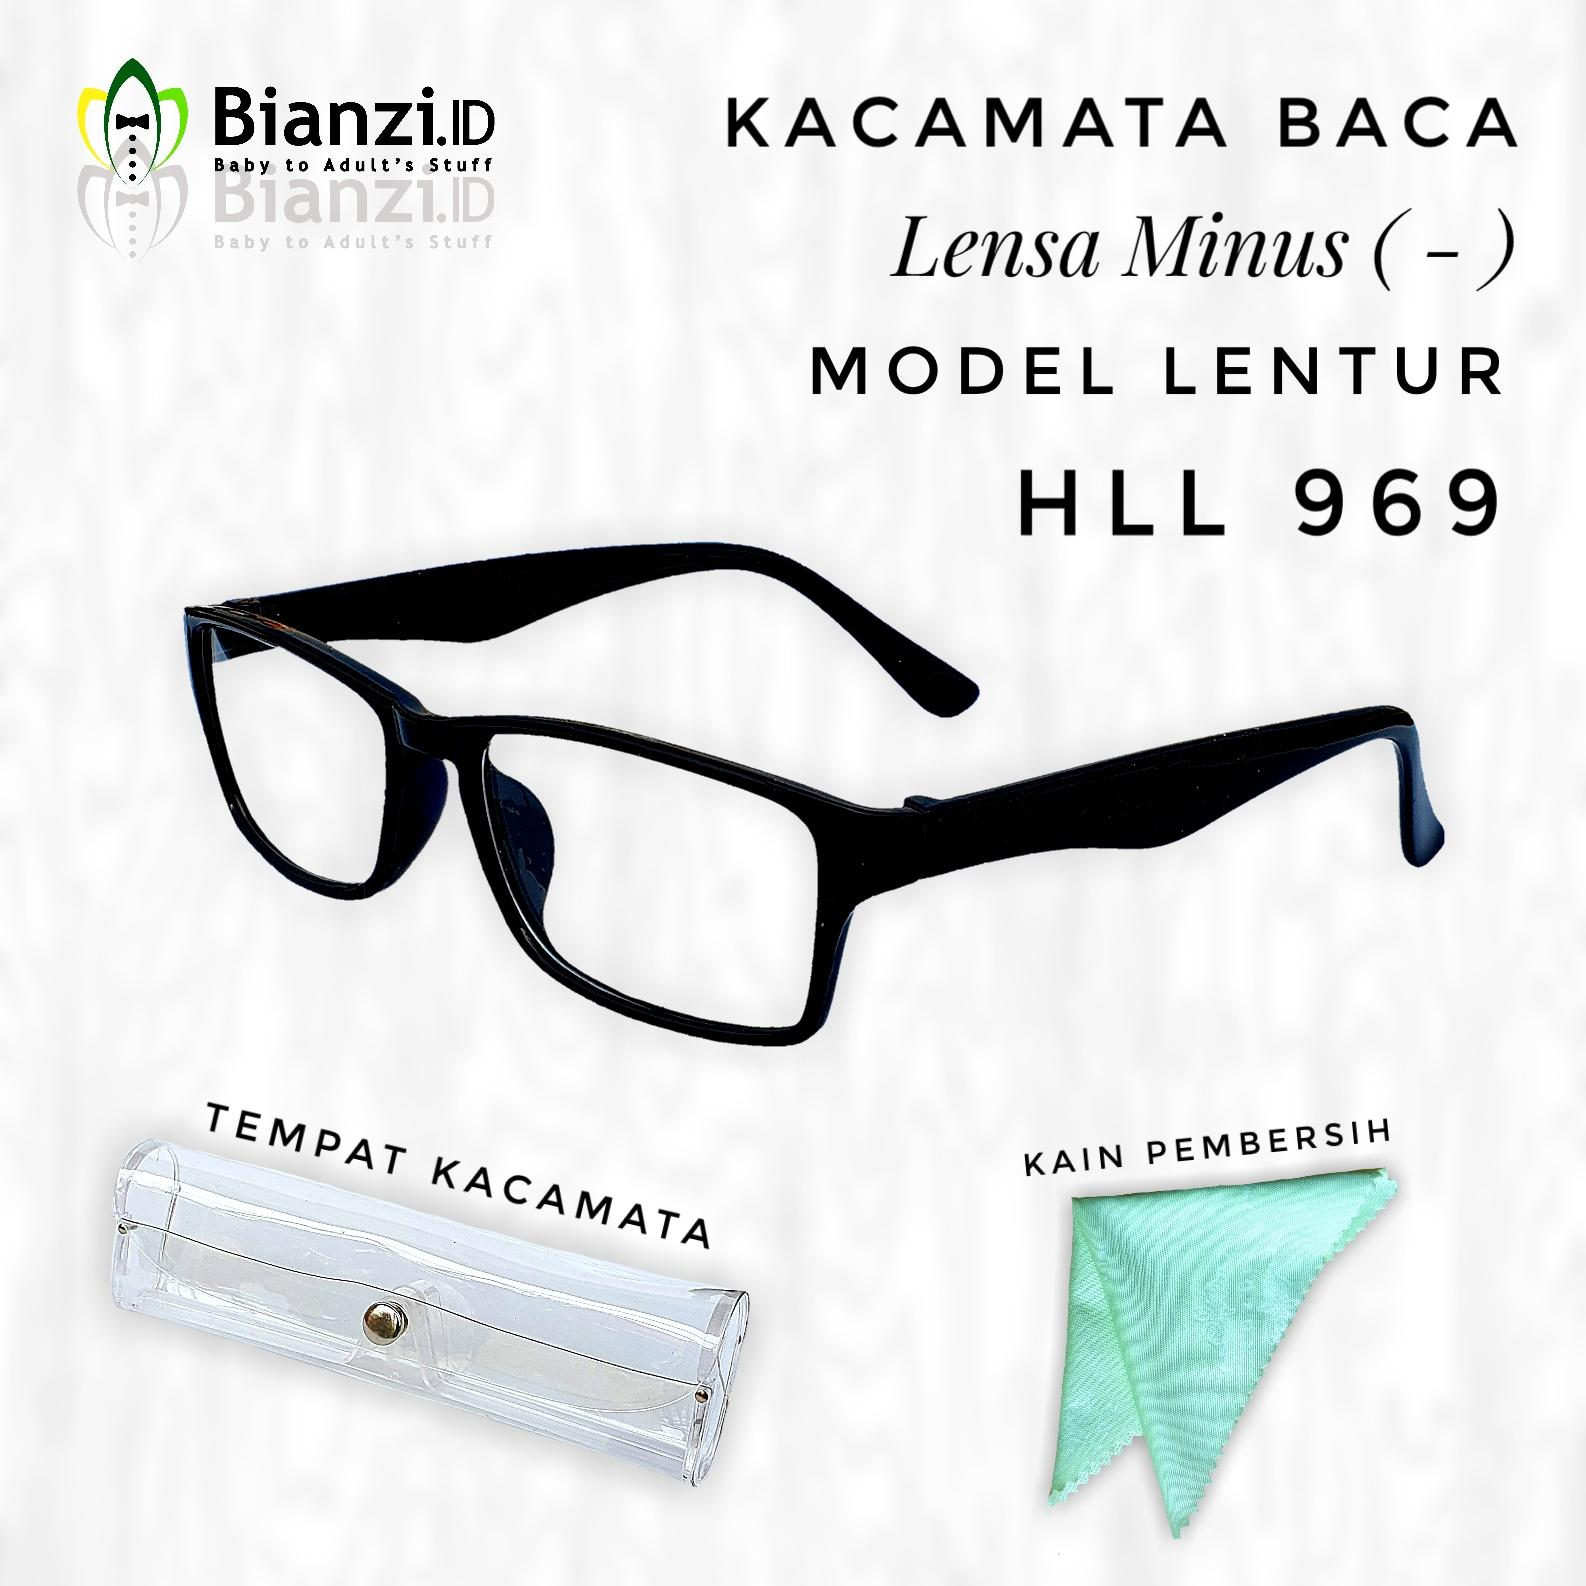 Kacamata Baca Minus ( - ) Model Kotak HLL969  08ff8fd402